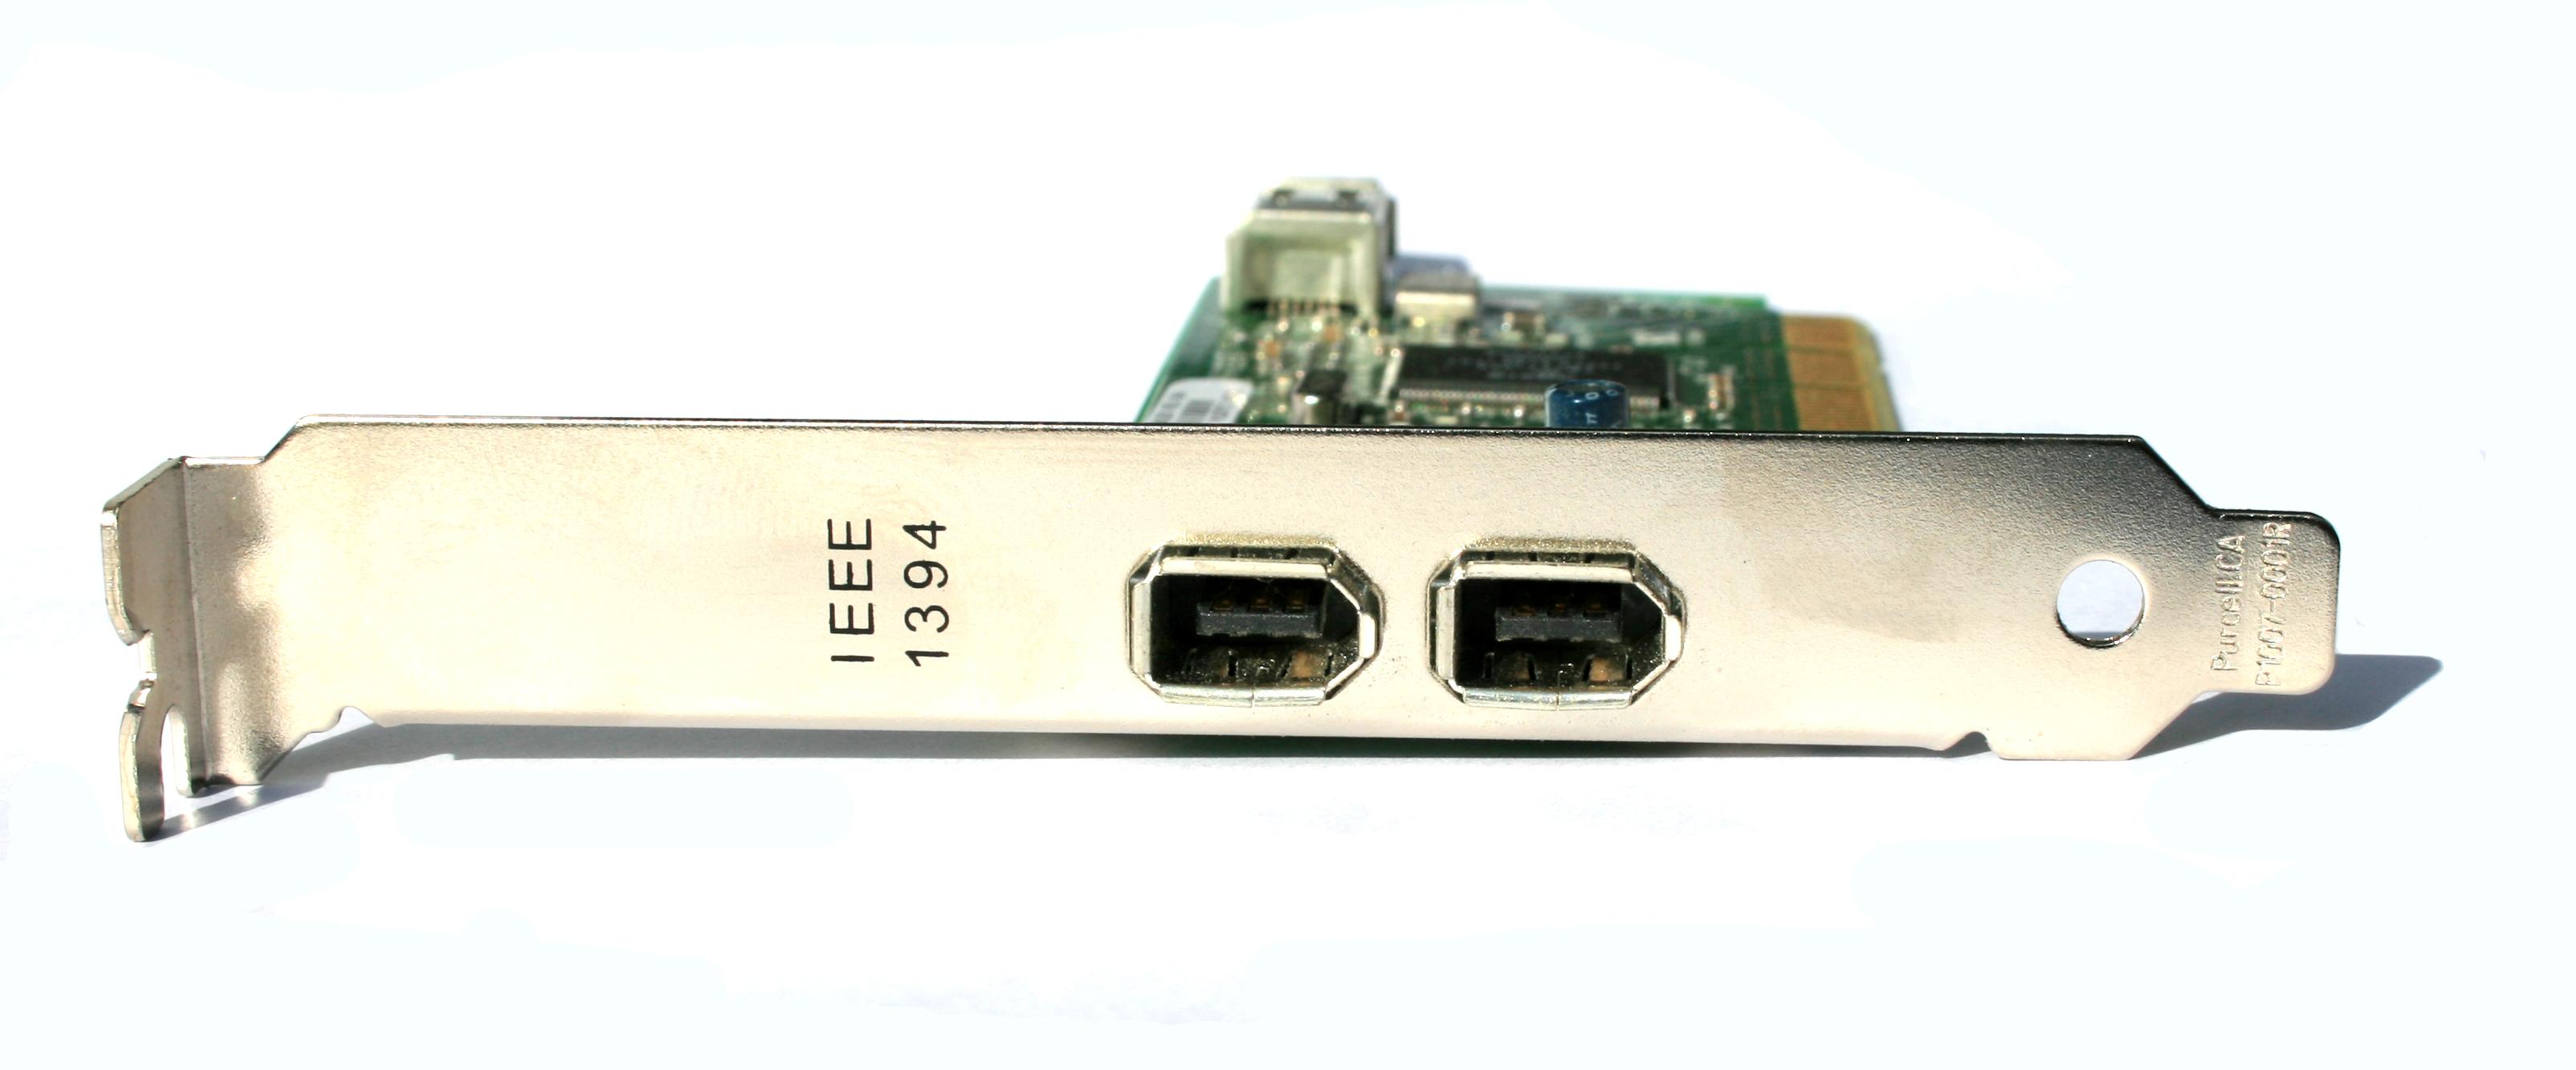 IEEE_1394_Firewire_PCI_Expansion_Card_Digon3.jpg